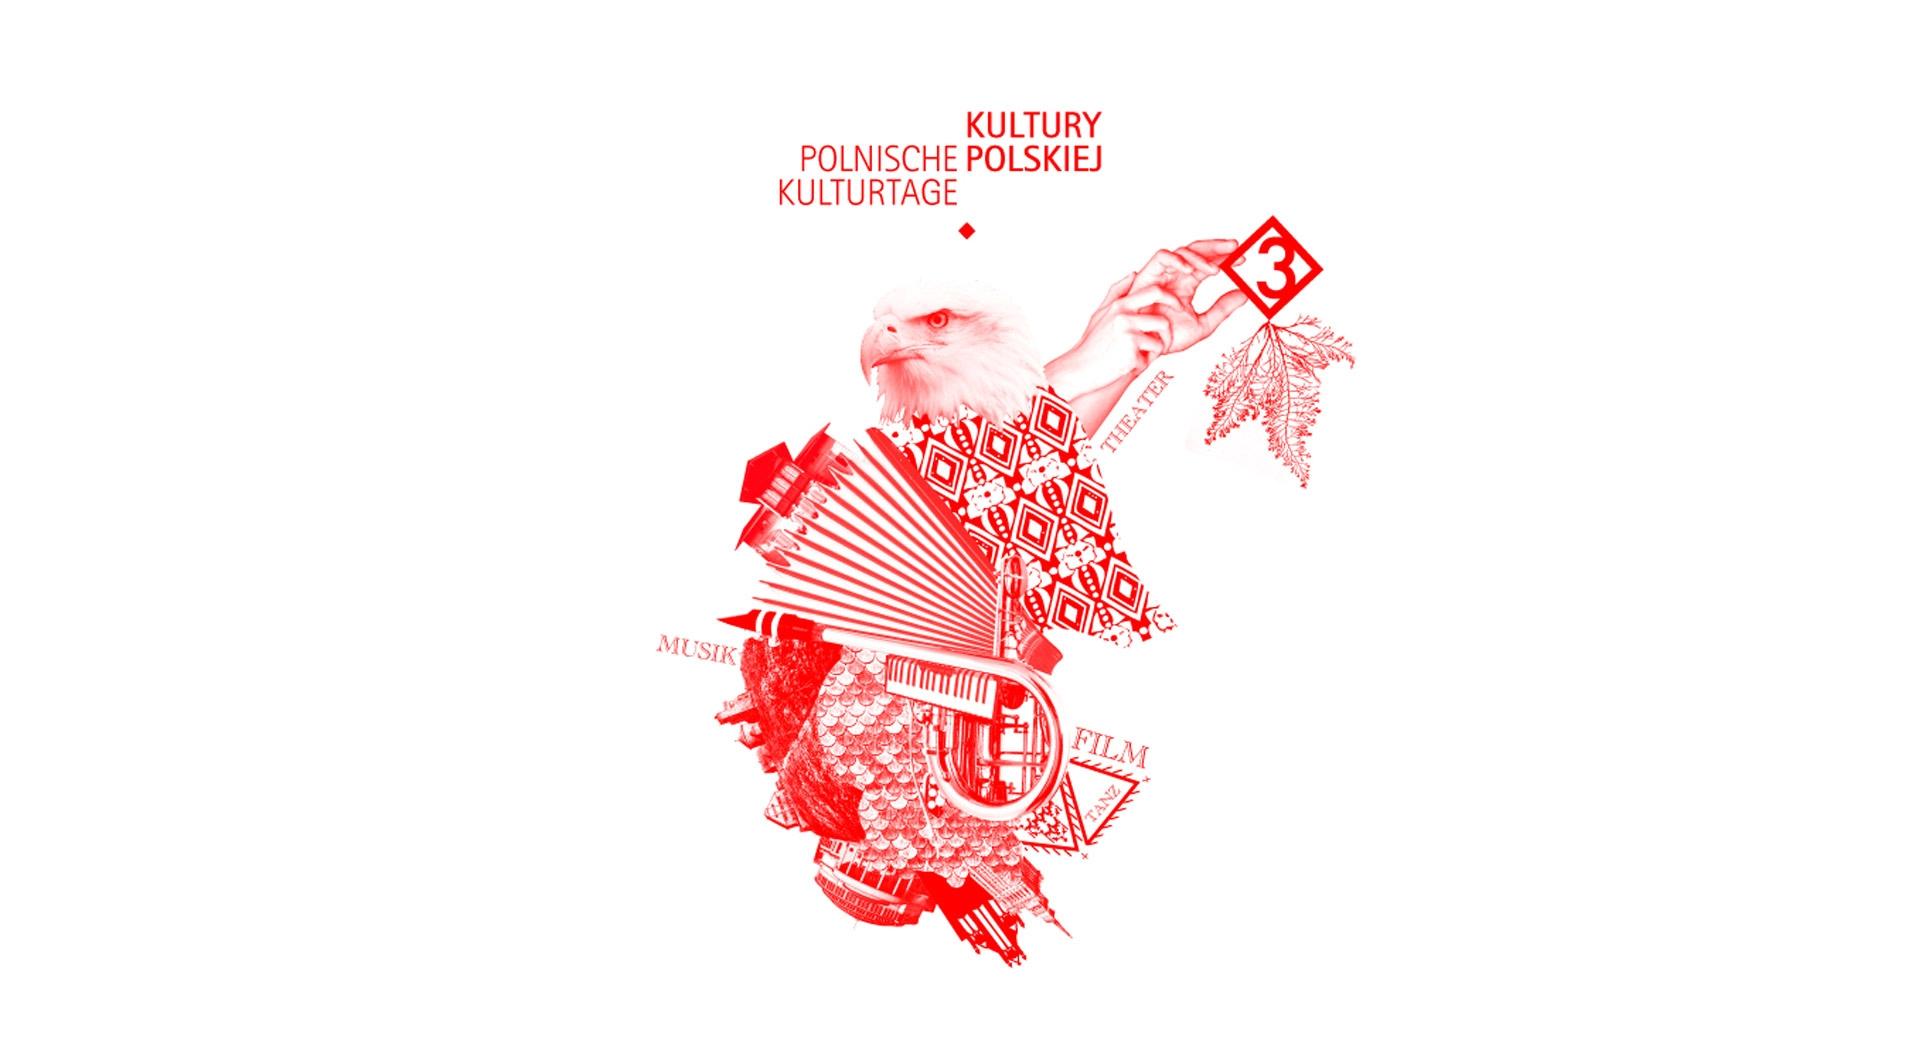 Svenja Limke <strong>Polnische Kulturtage</strong></br>Visual